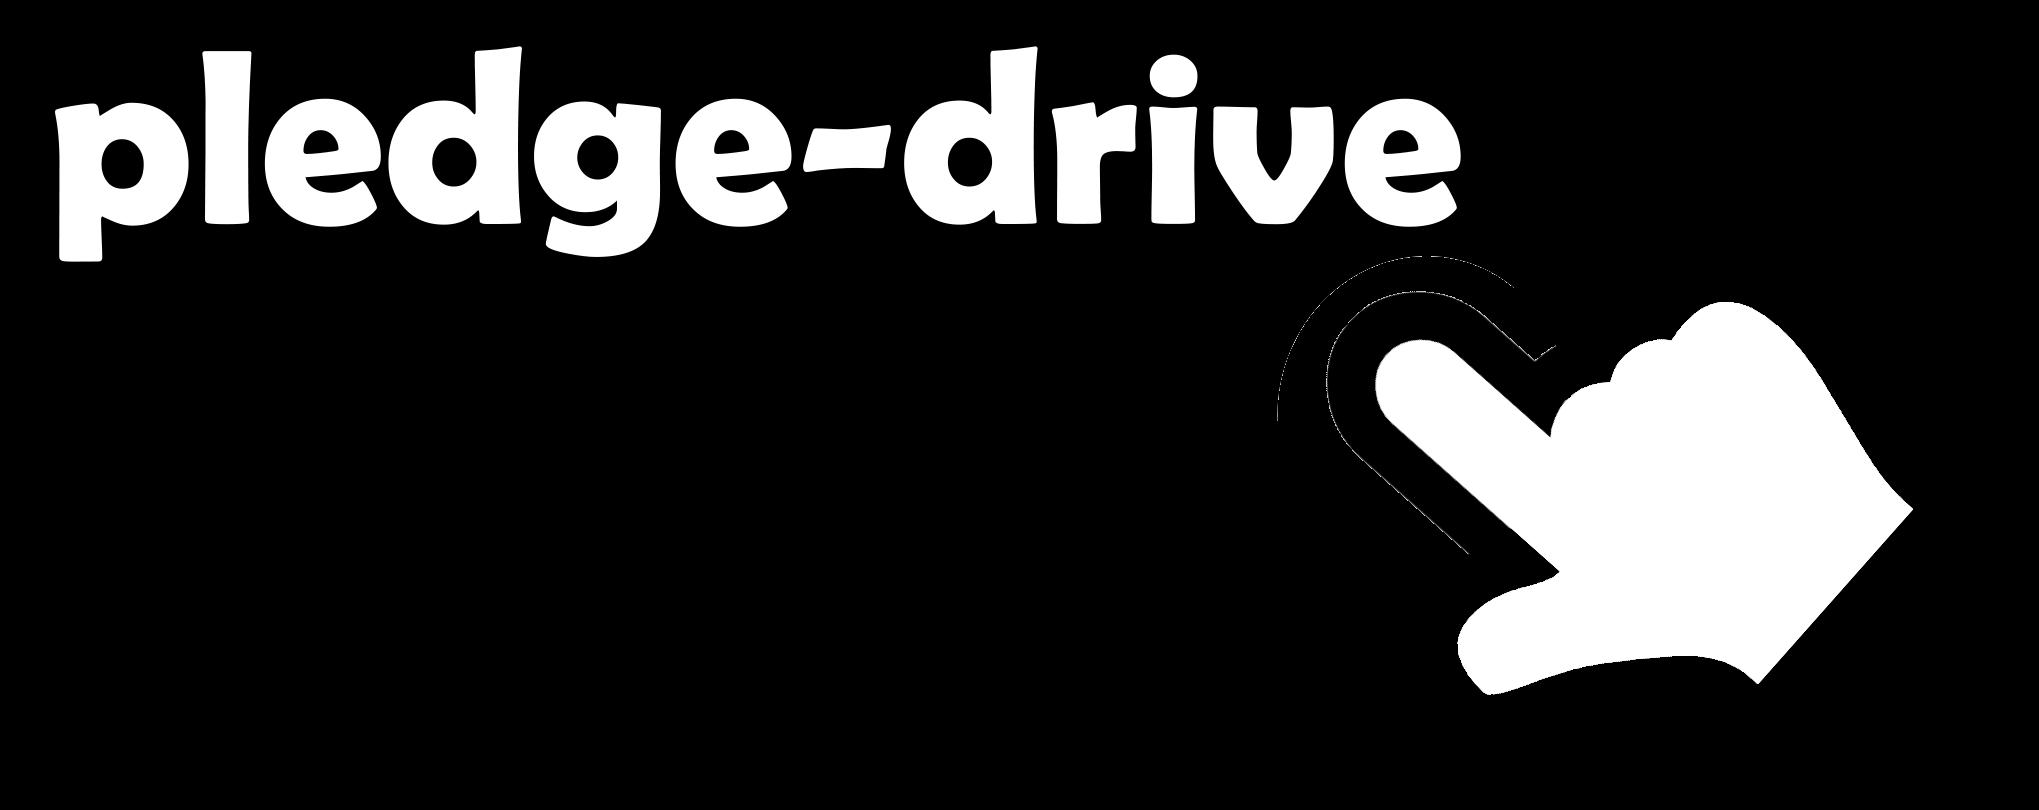 pledge-drive.net